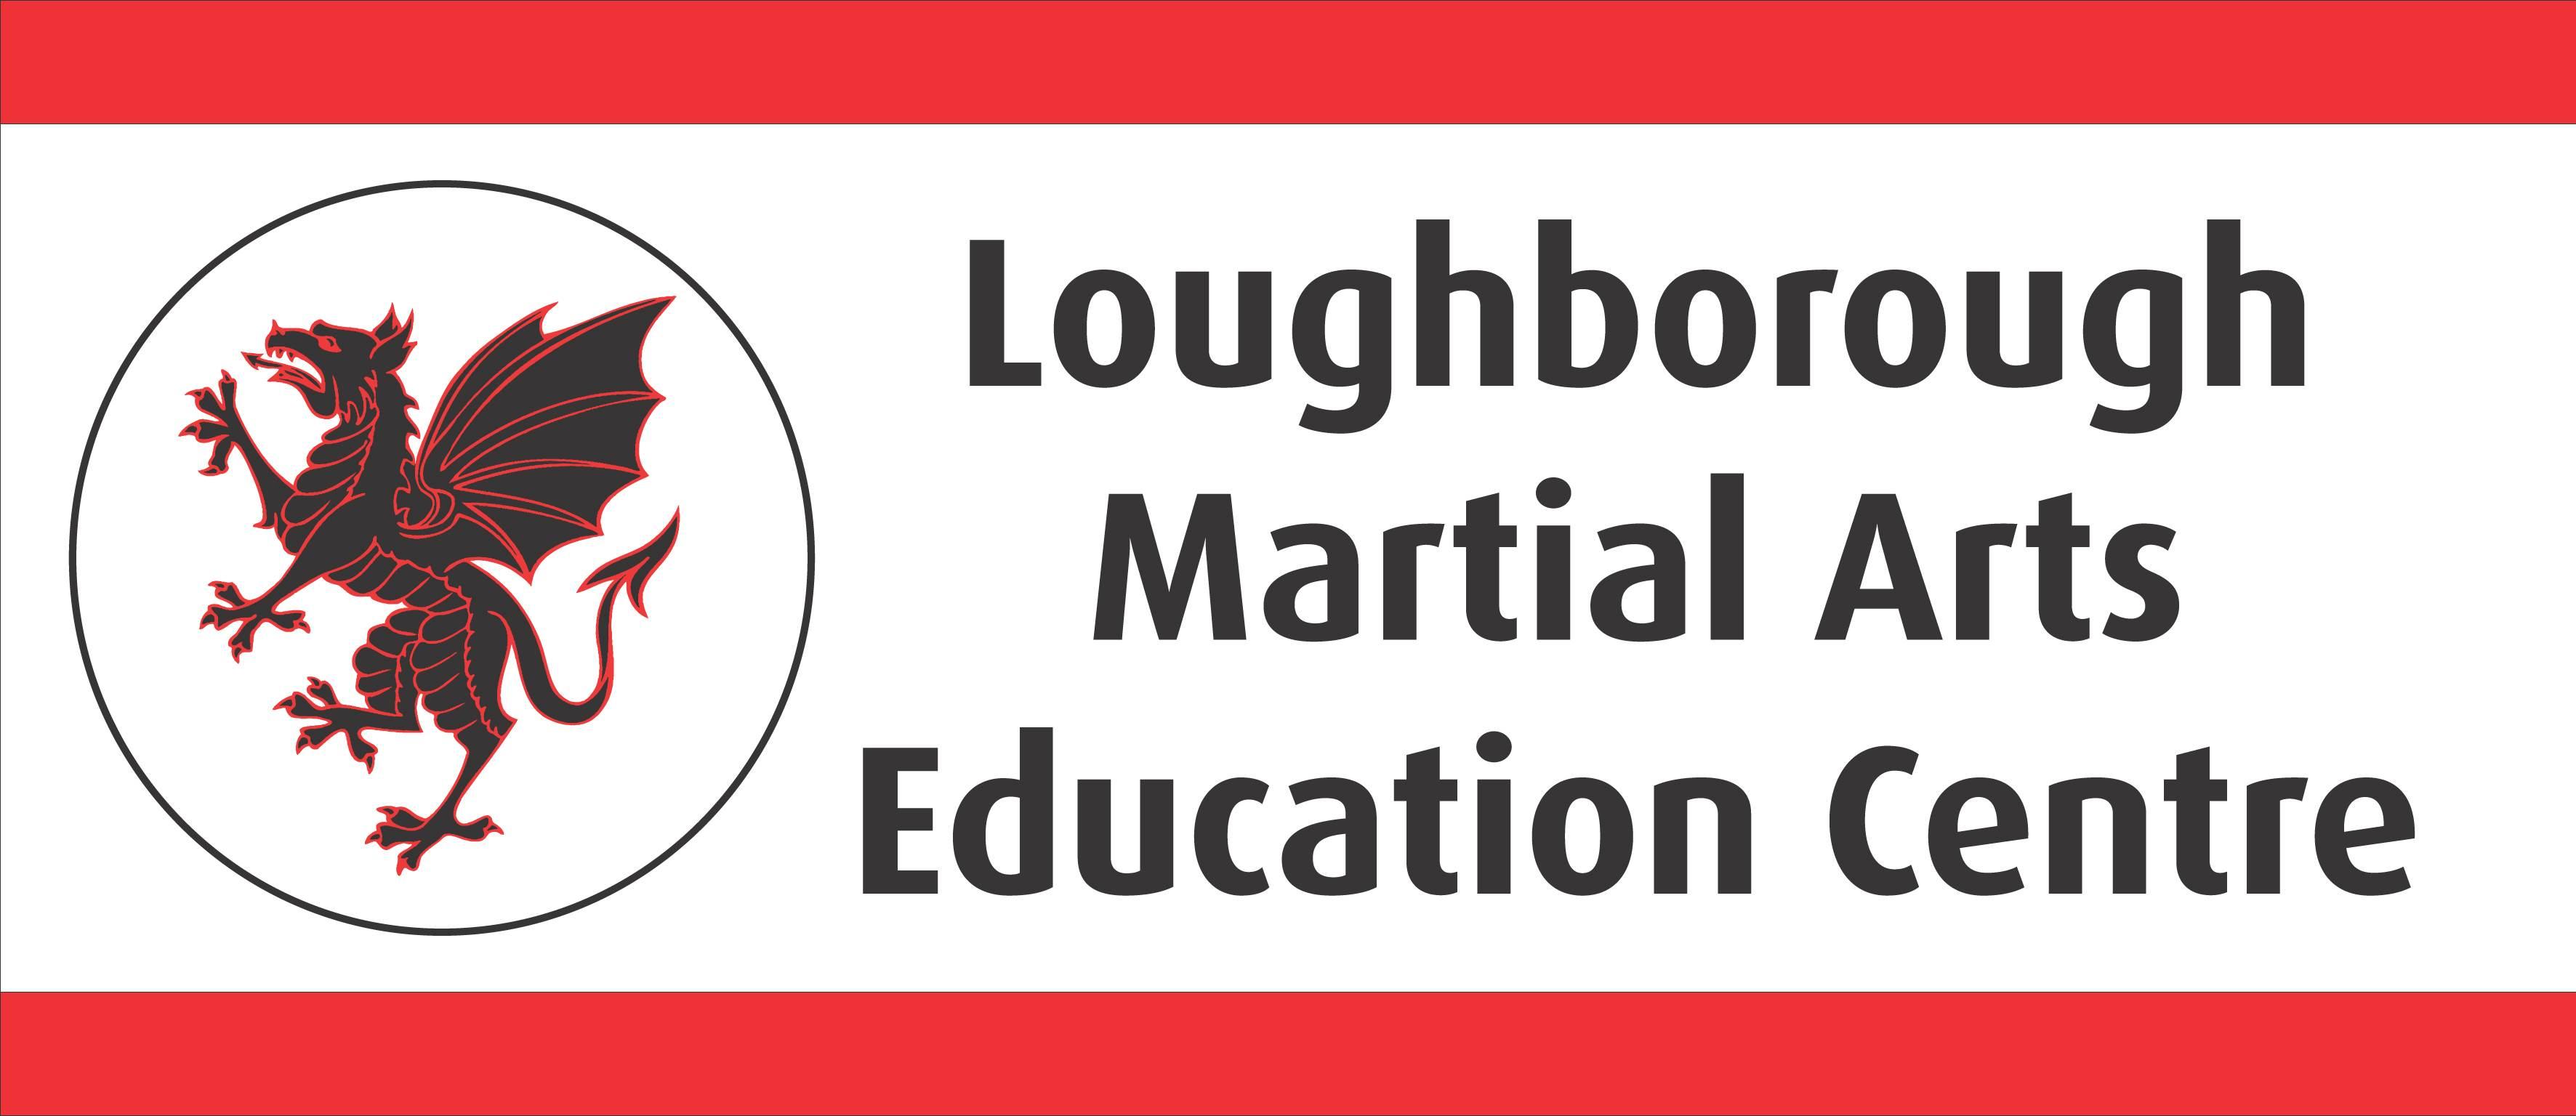 East Midlands Martial Arts - Leicestershire, Leicestershire LE11 3DU - 07984 424811 | ShowMeLocal.com